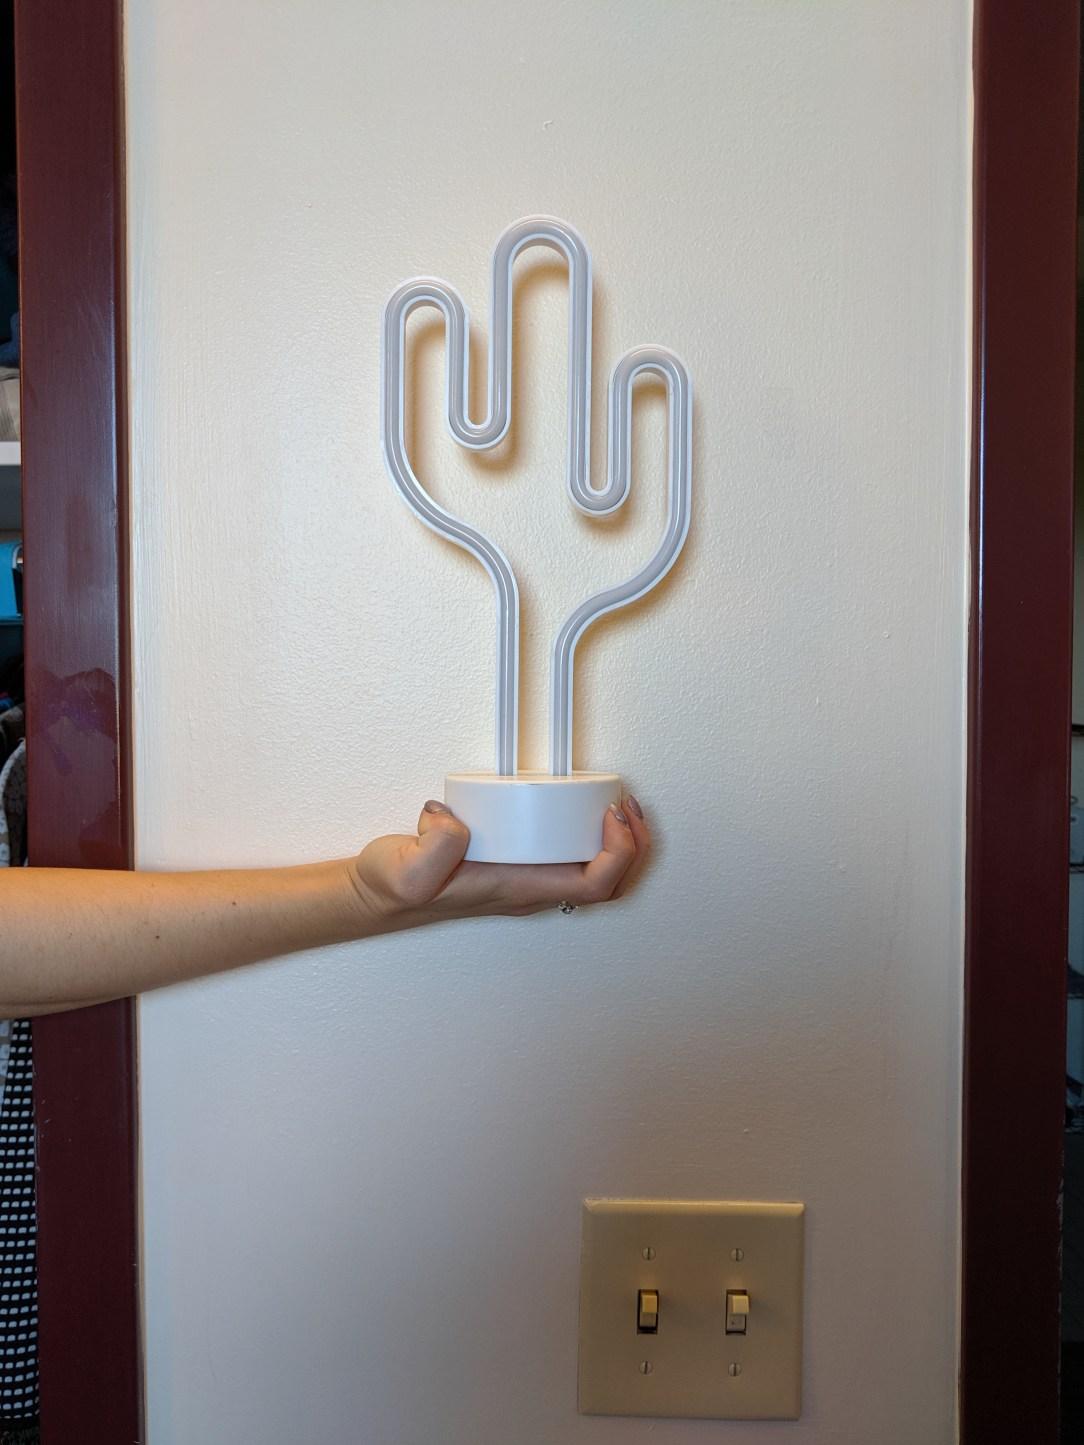 cactus light, Pier 1 Imports